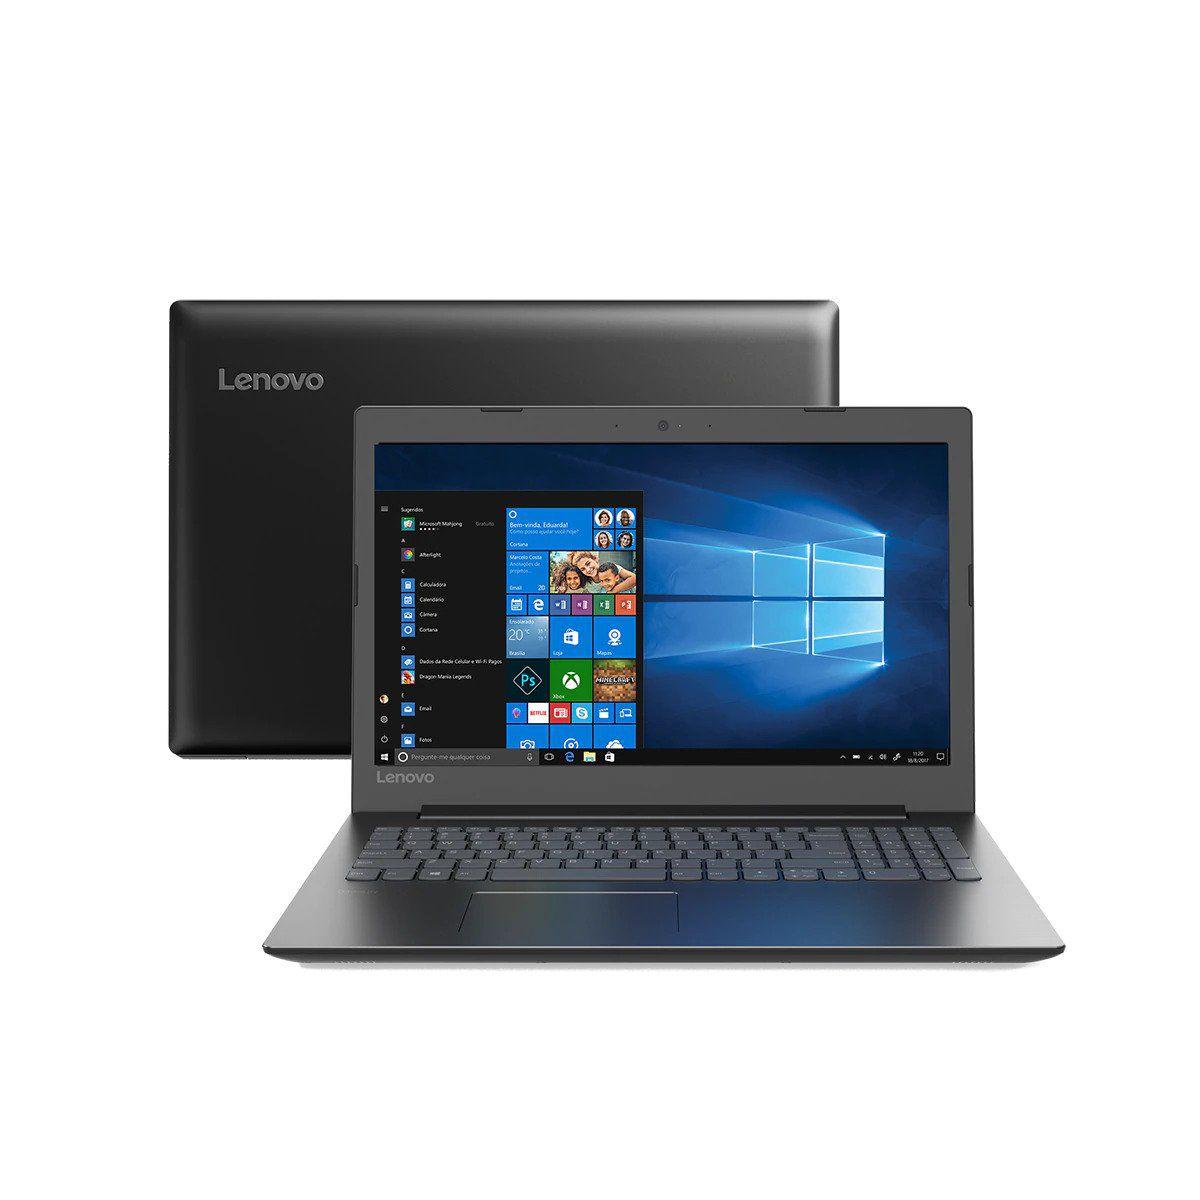 Notebook Lenovo Intel Core I3 7020U 4GB 500GB Windows 10 Home